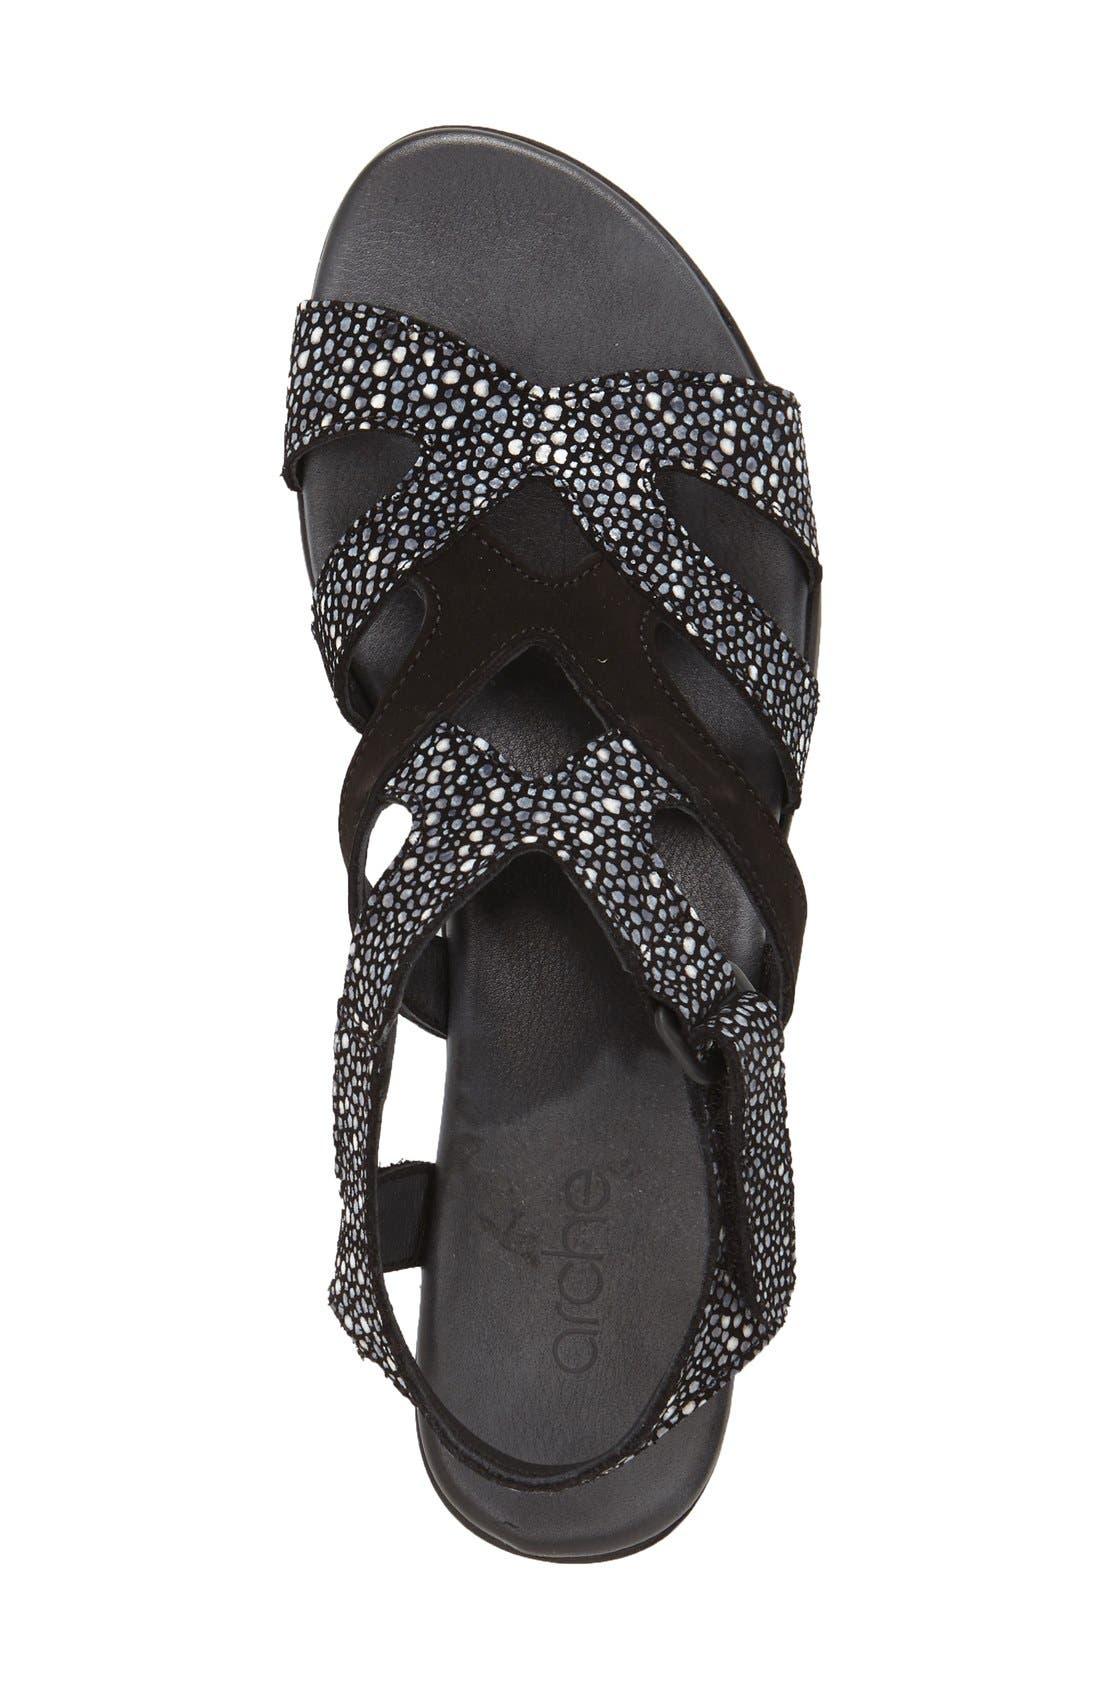 Alternate Image 3  - Arche 'Obela' Water Resistant Leather Sandal (Women)